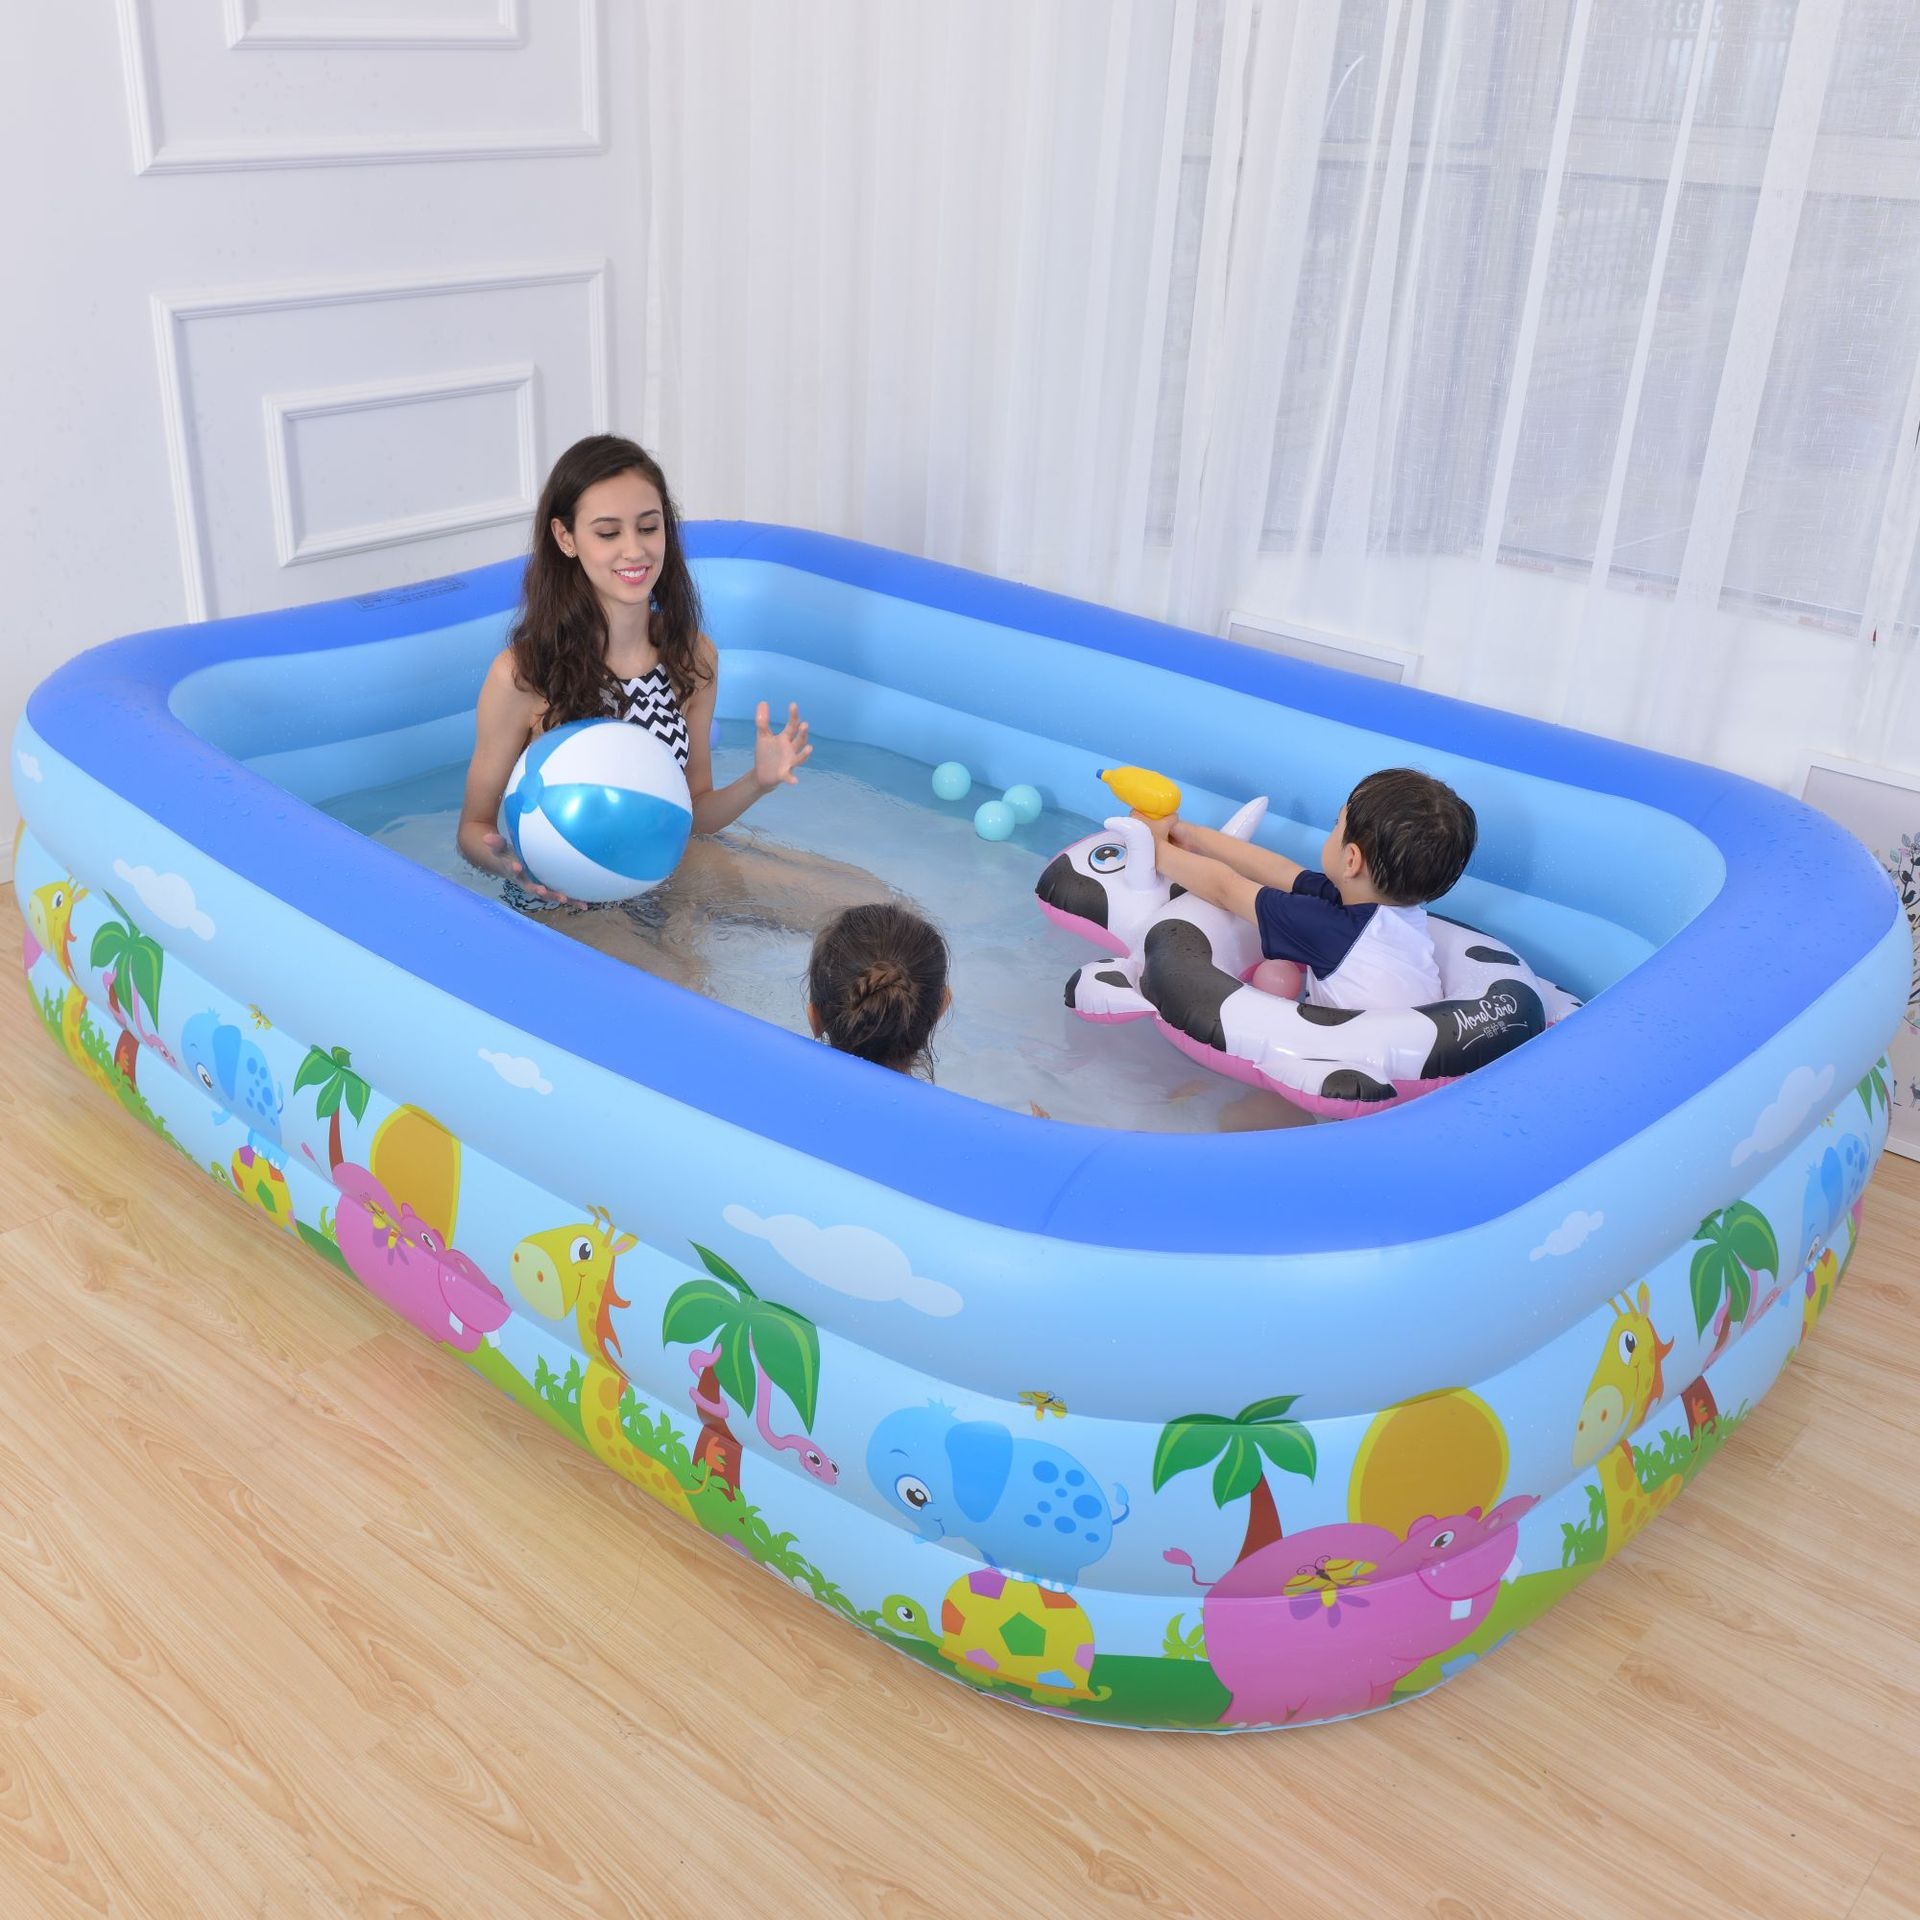 Inflatable Swim Center Family Lounge Pool Animal Kids Rectangular 3 Rings Pool Children's Summer Water Play Swim Pool